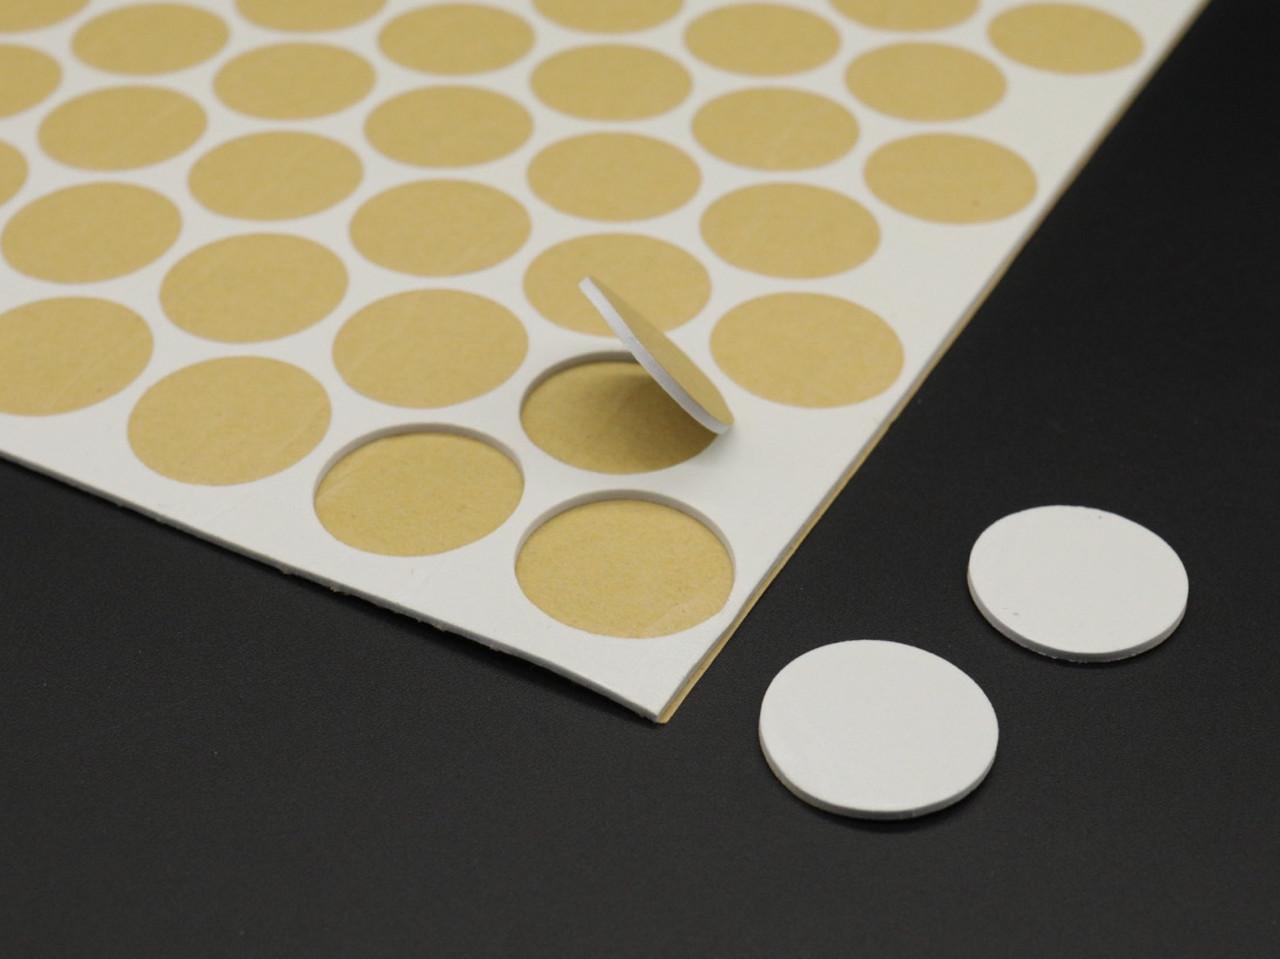 Двухсторонняя липкая крепежная лента 2мм толщина. Цвет белый. 25мм. 90шт/аркуш